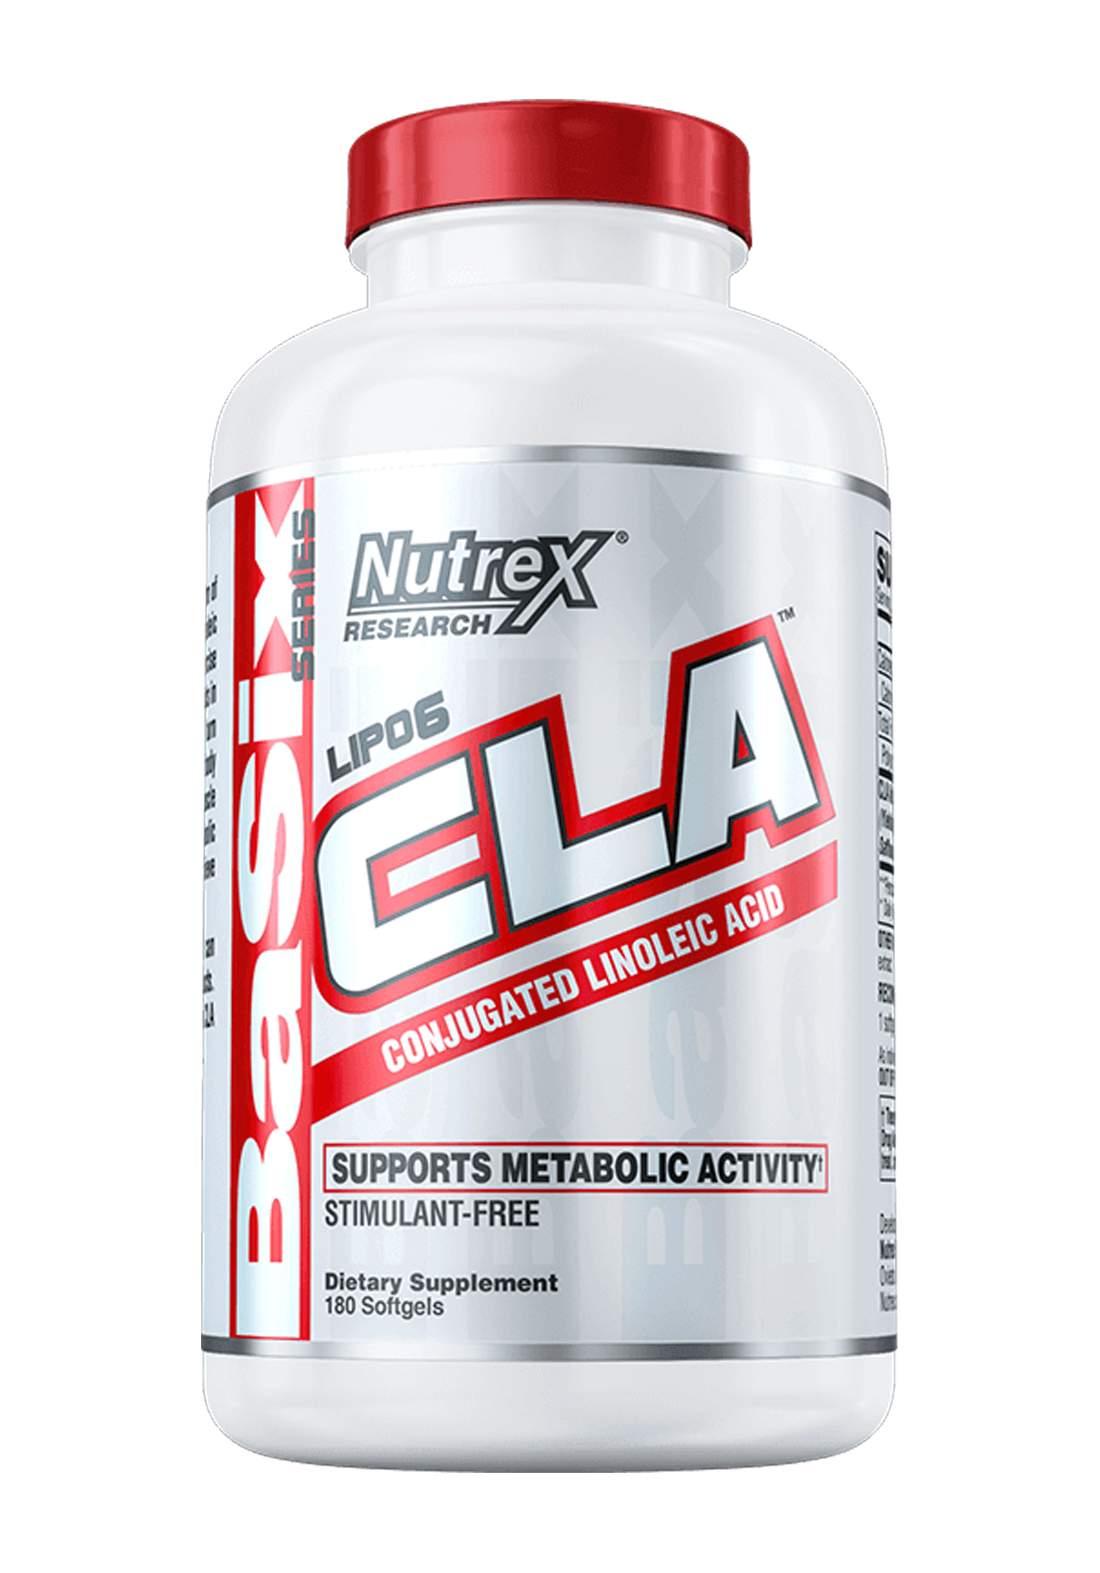 Nutrex Lipo 6  CLA Conjugated Linoleic Acid 180 Soft Gel 1000mg   مكمل غذائي لانقاص الوزن